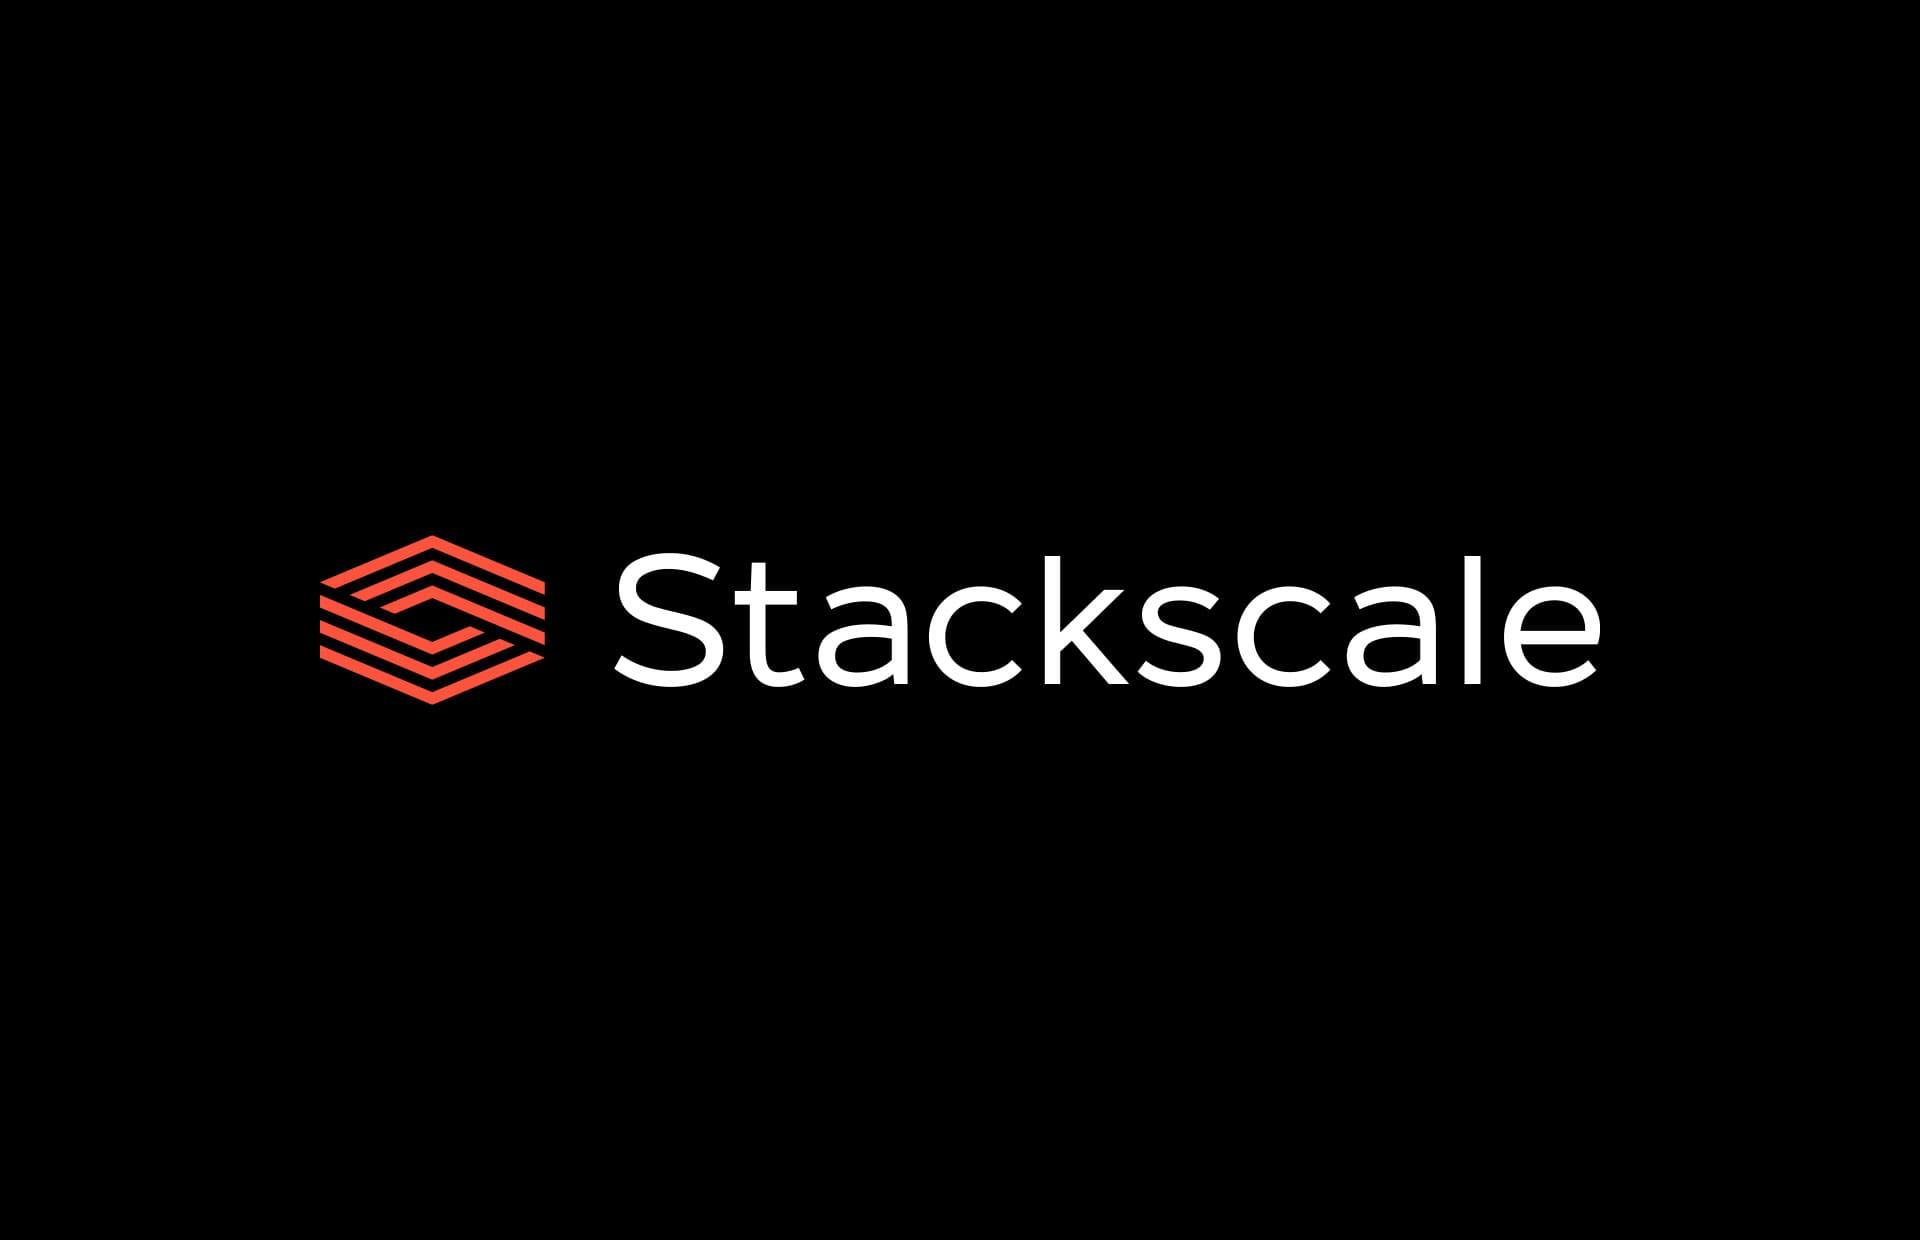 Stackscale's logo